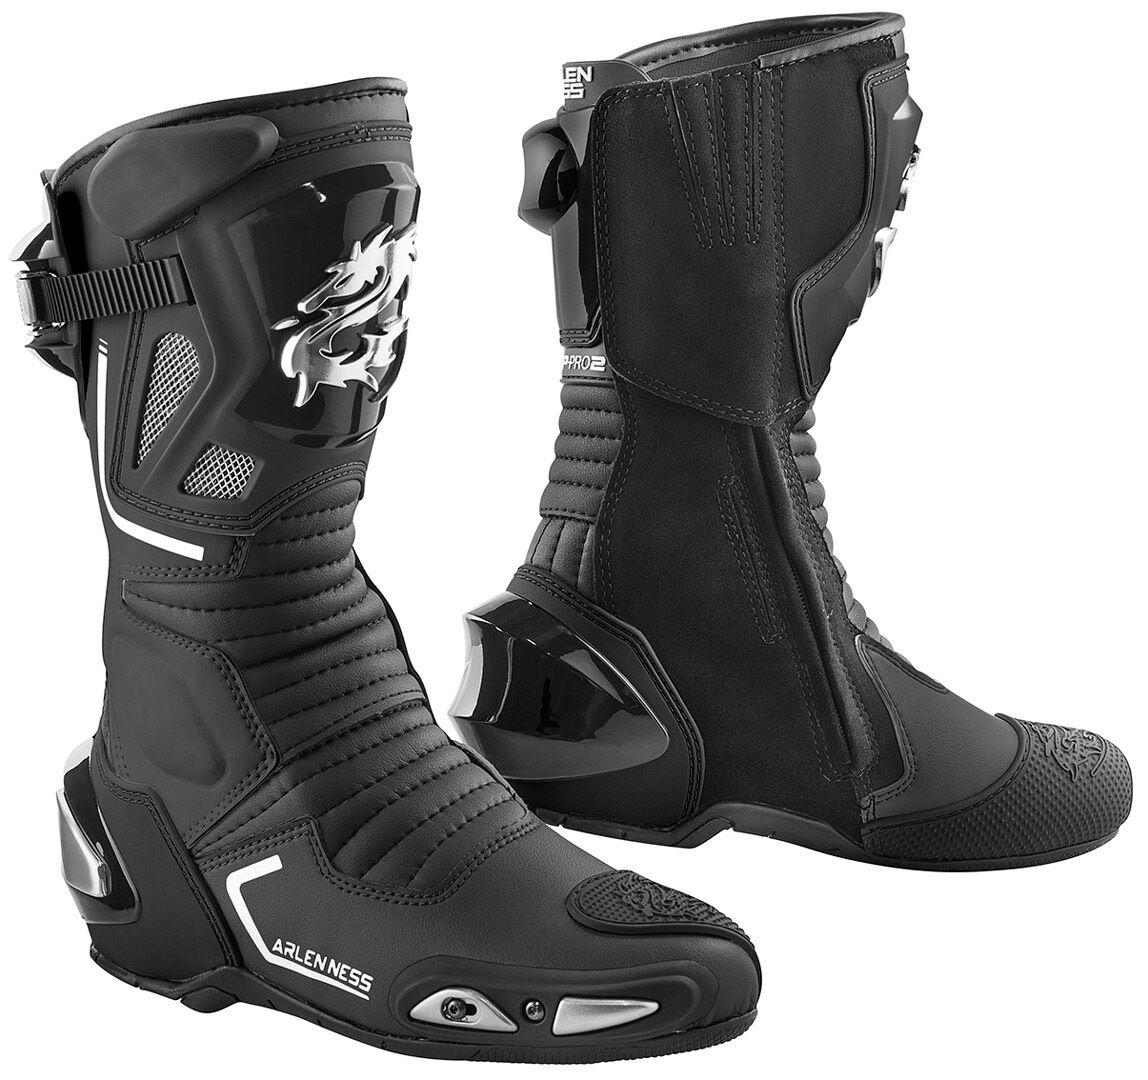 Arlen Ness Sugello Bottes de moto Noir taille : 42